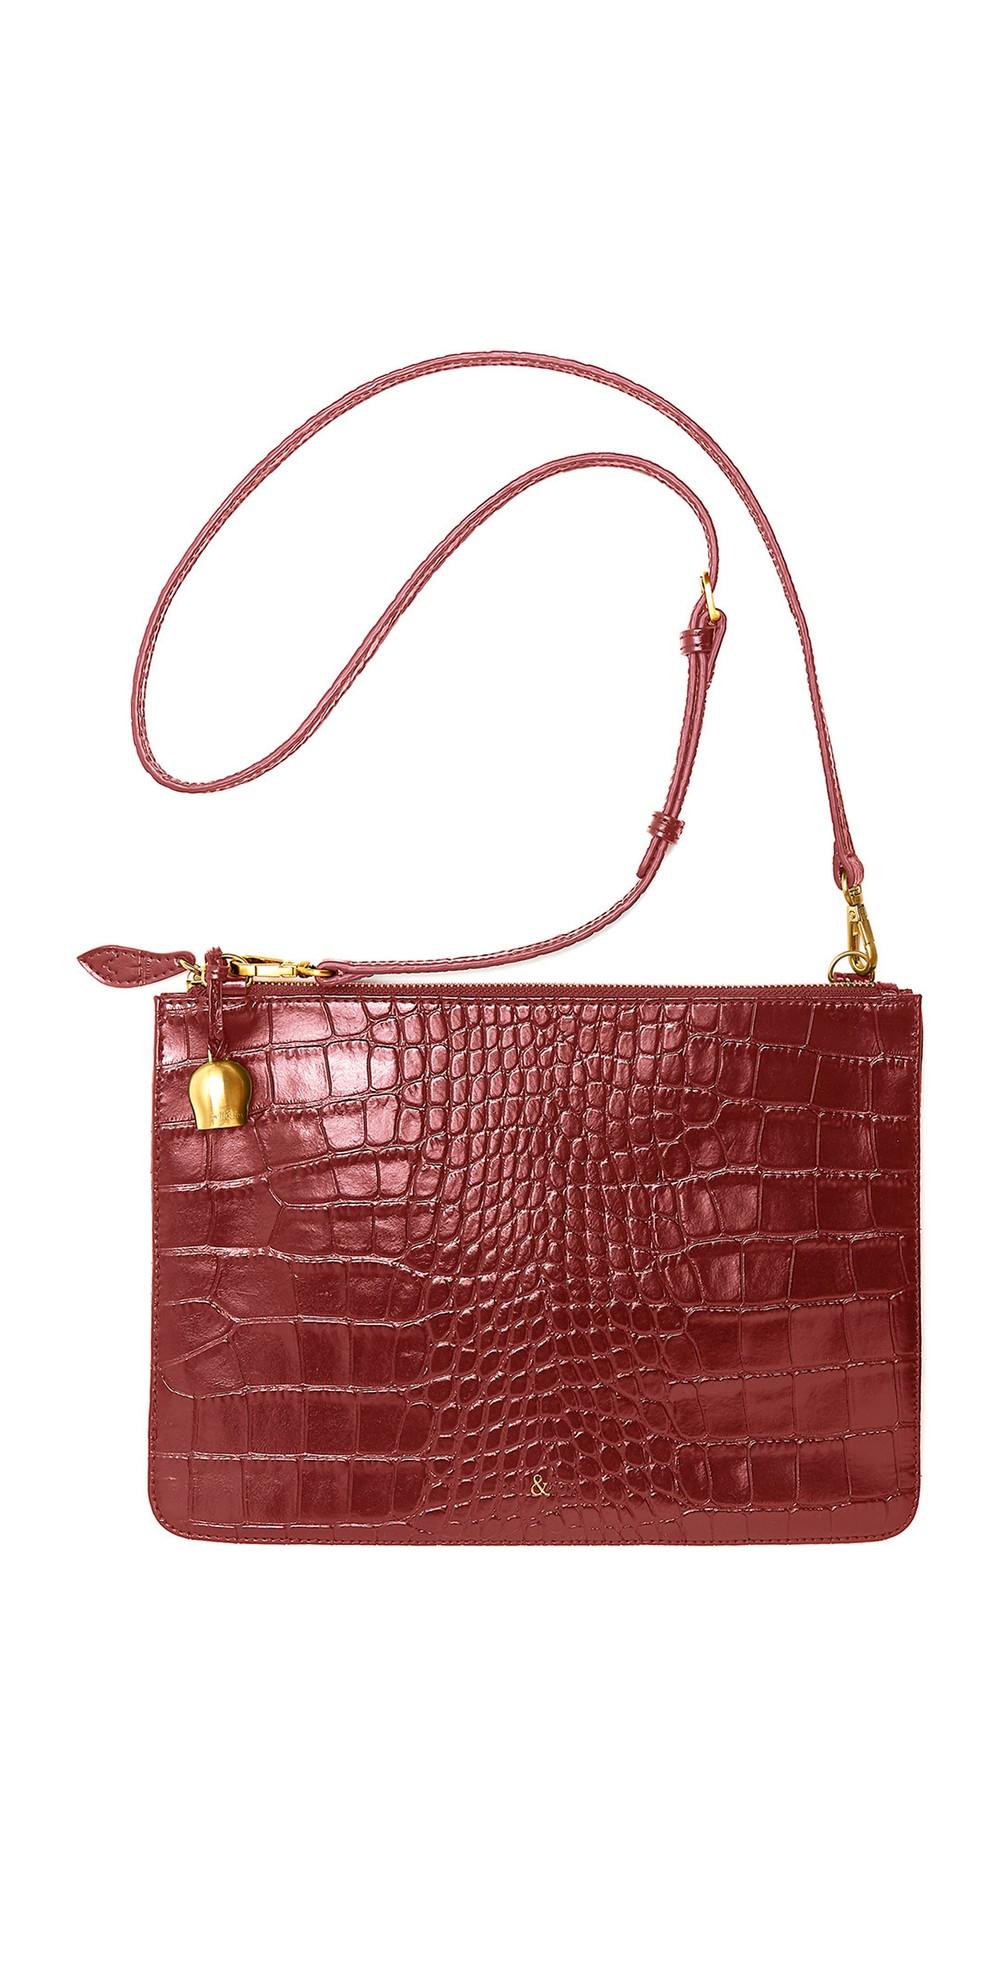 Gia Oversized Clutch/Cross Body Bag main image